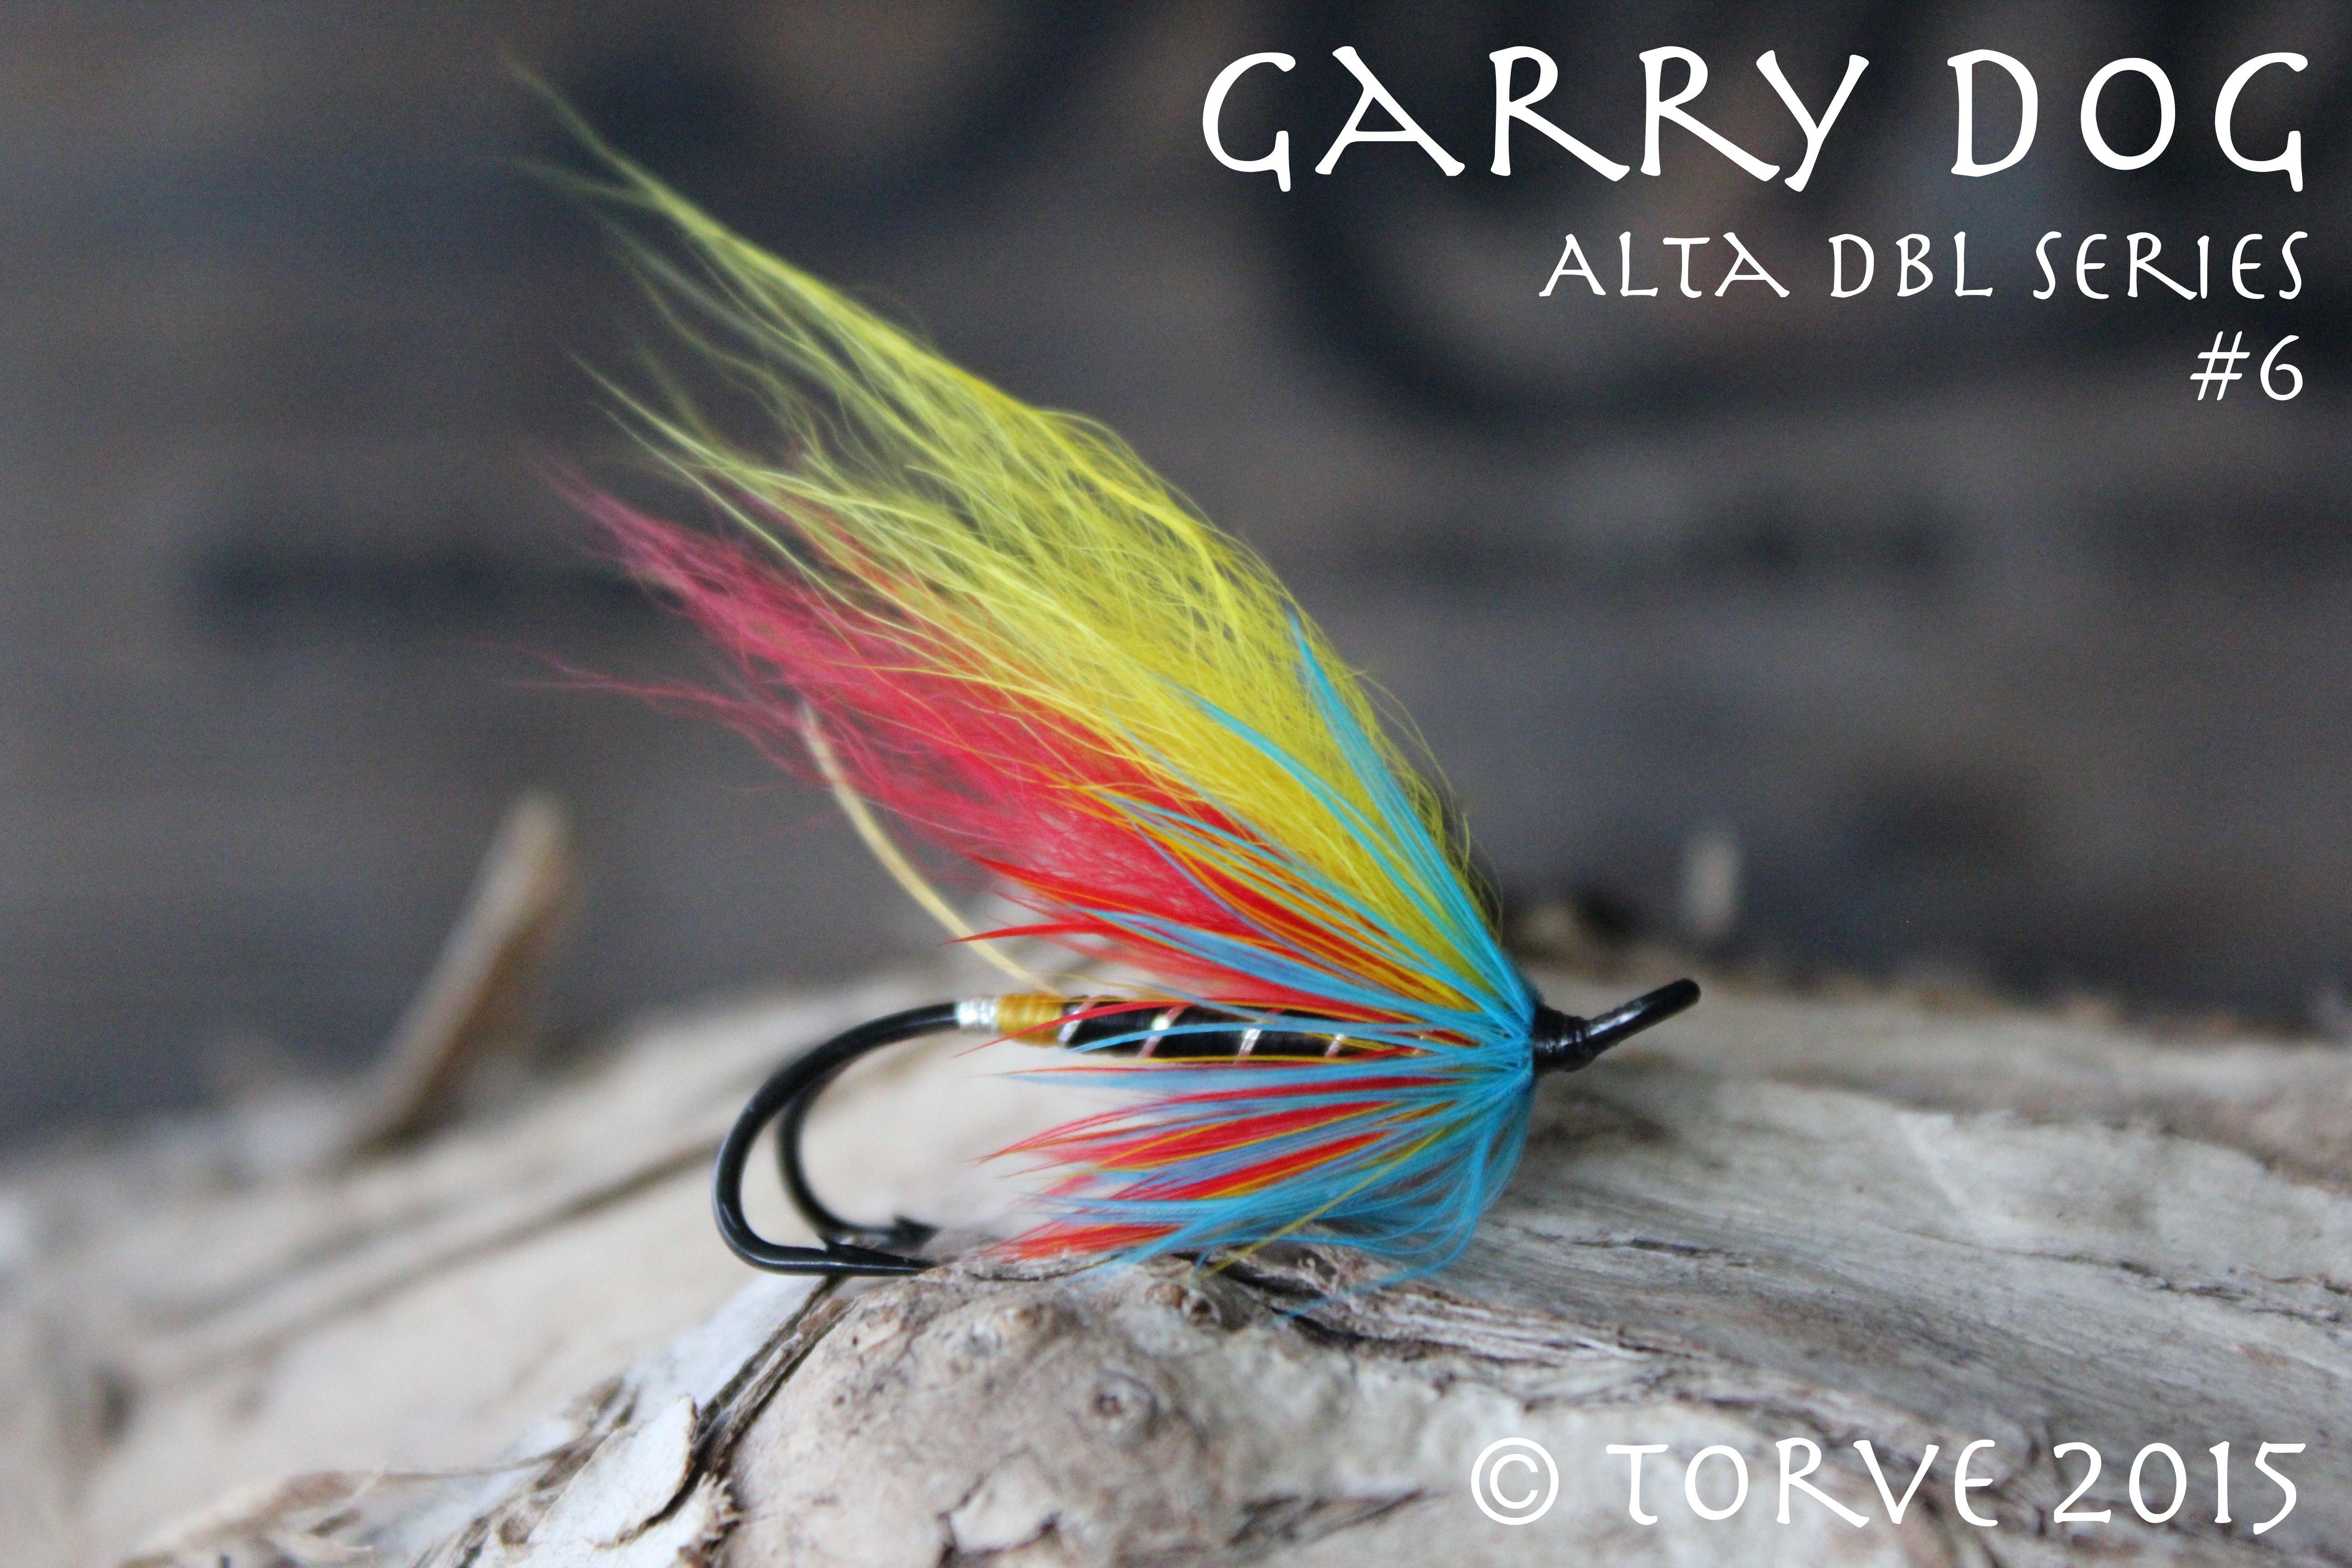 Garry Dog Variant Slamon Hook Flies Series Tied By Torve The